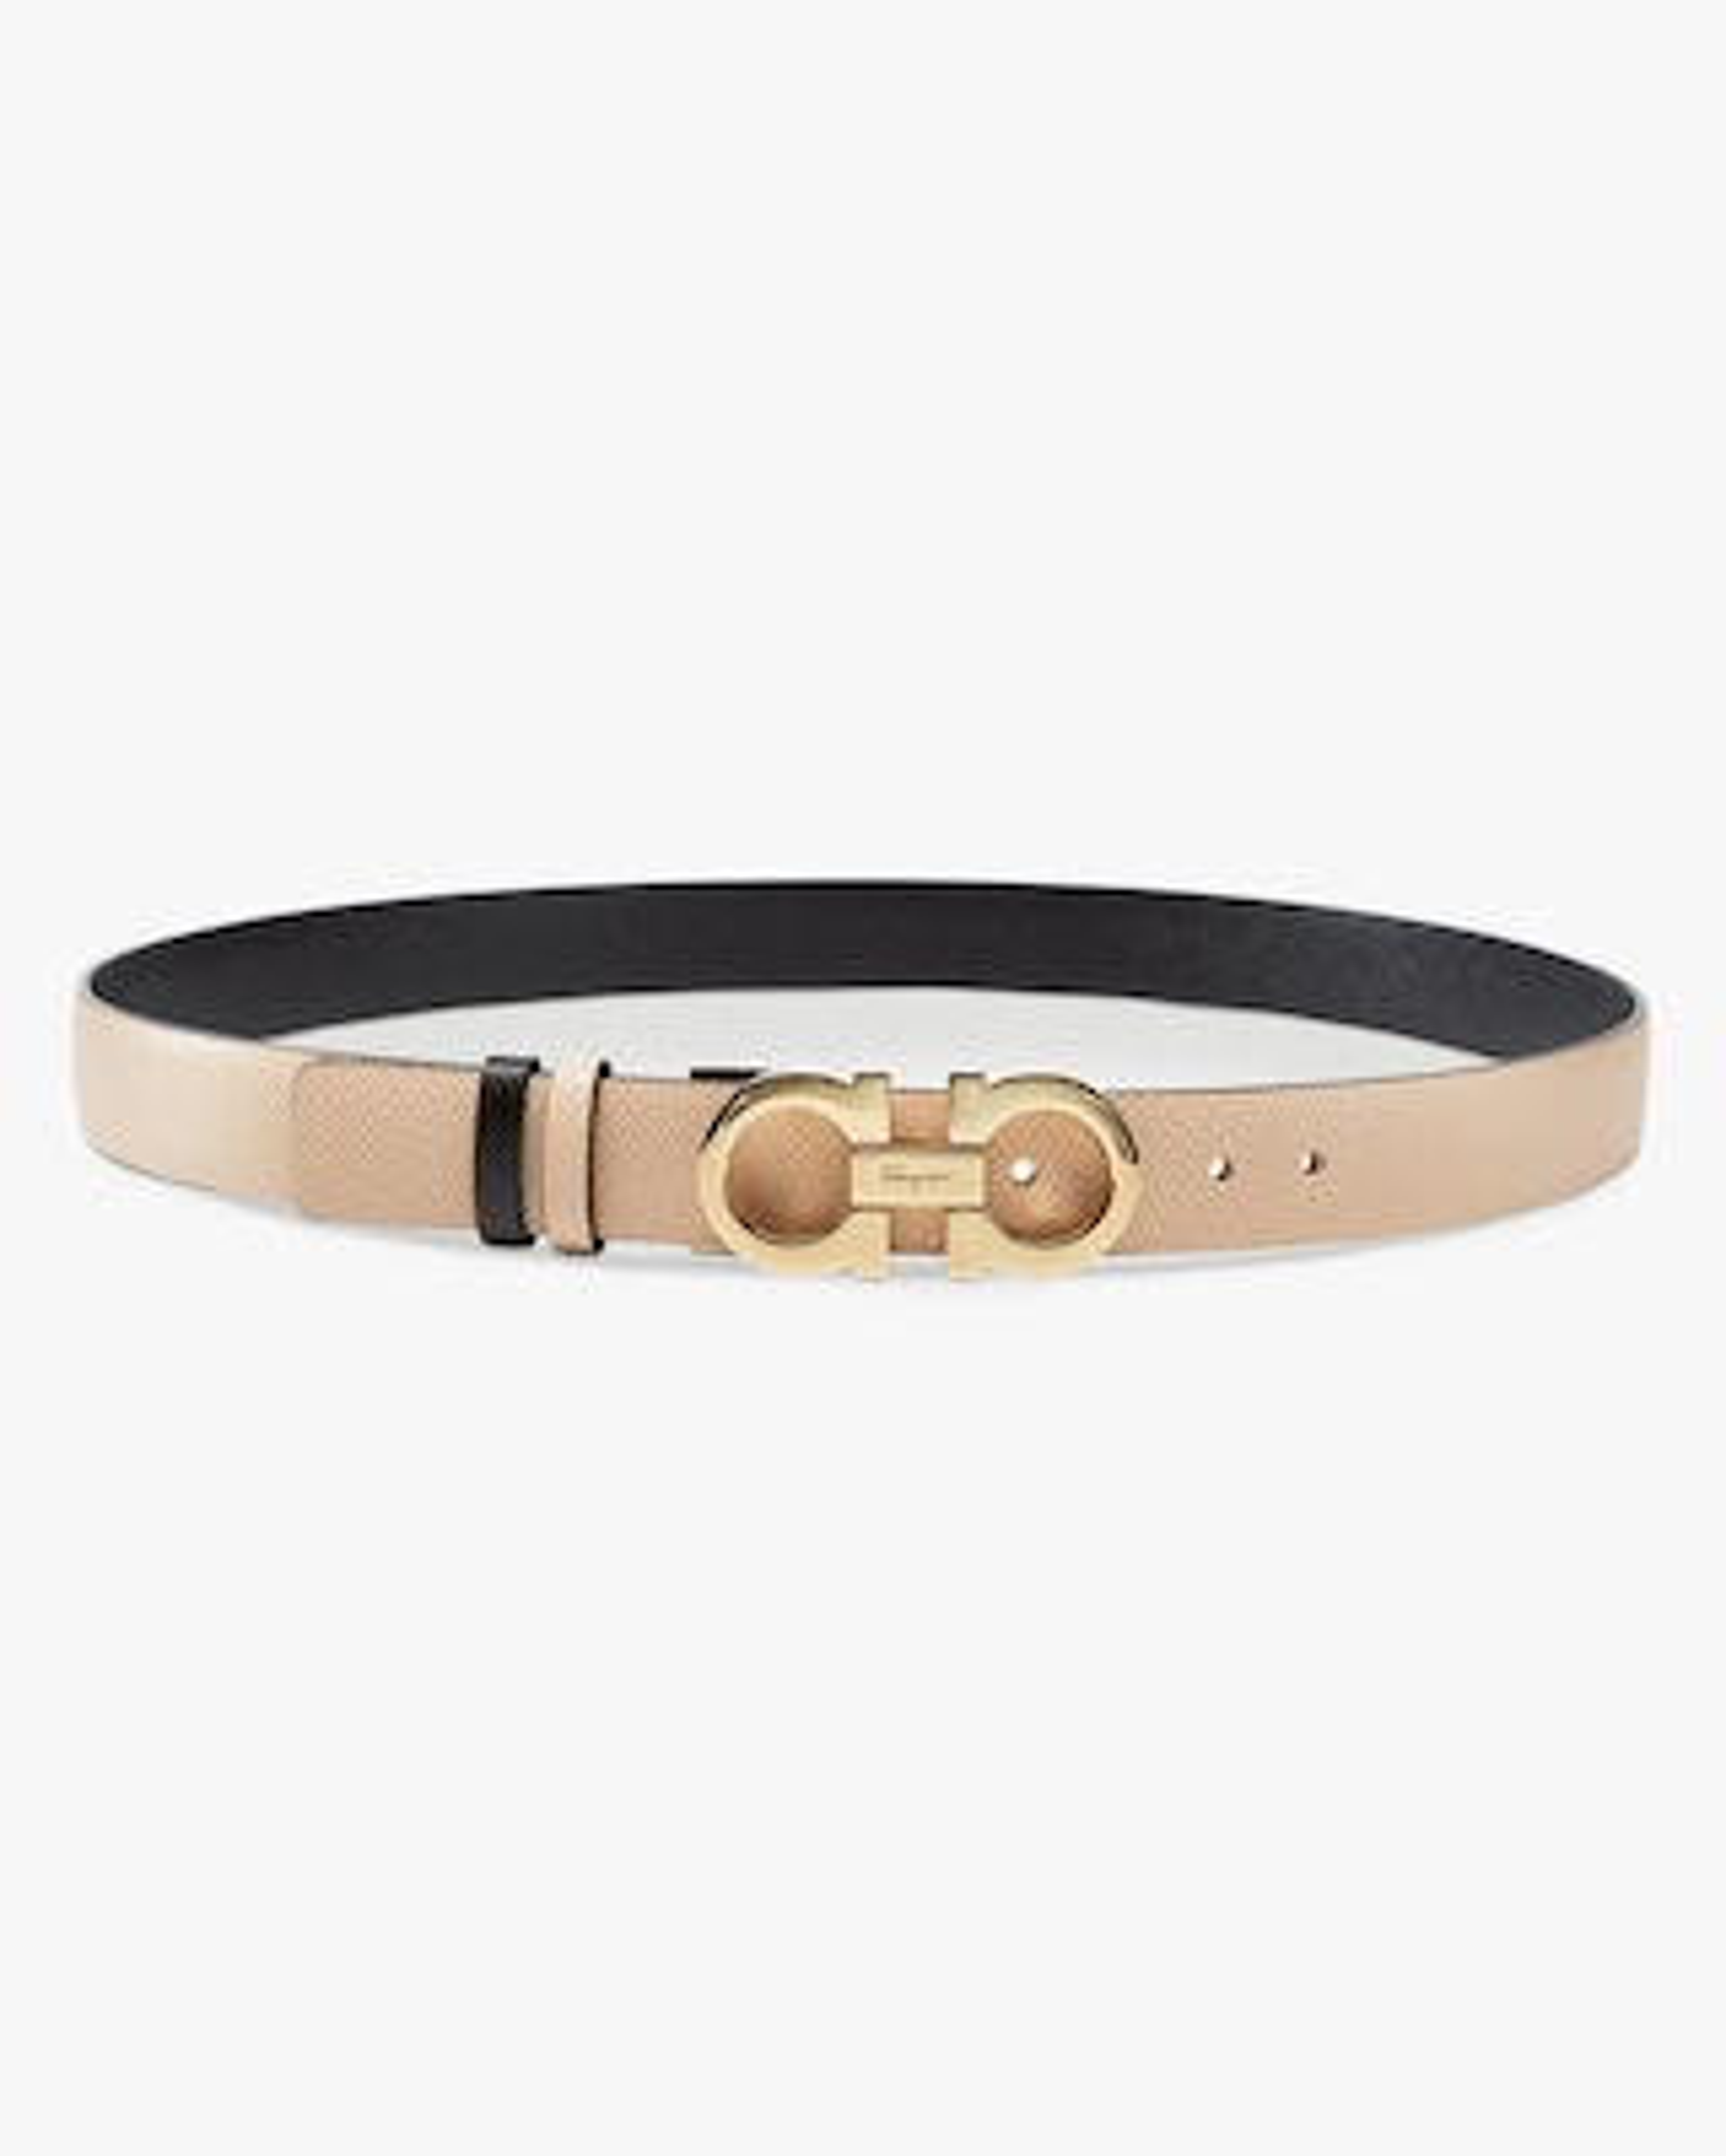 Salvatore Ferragamo Skinny Reversible Gancini Leather Belt 1